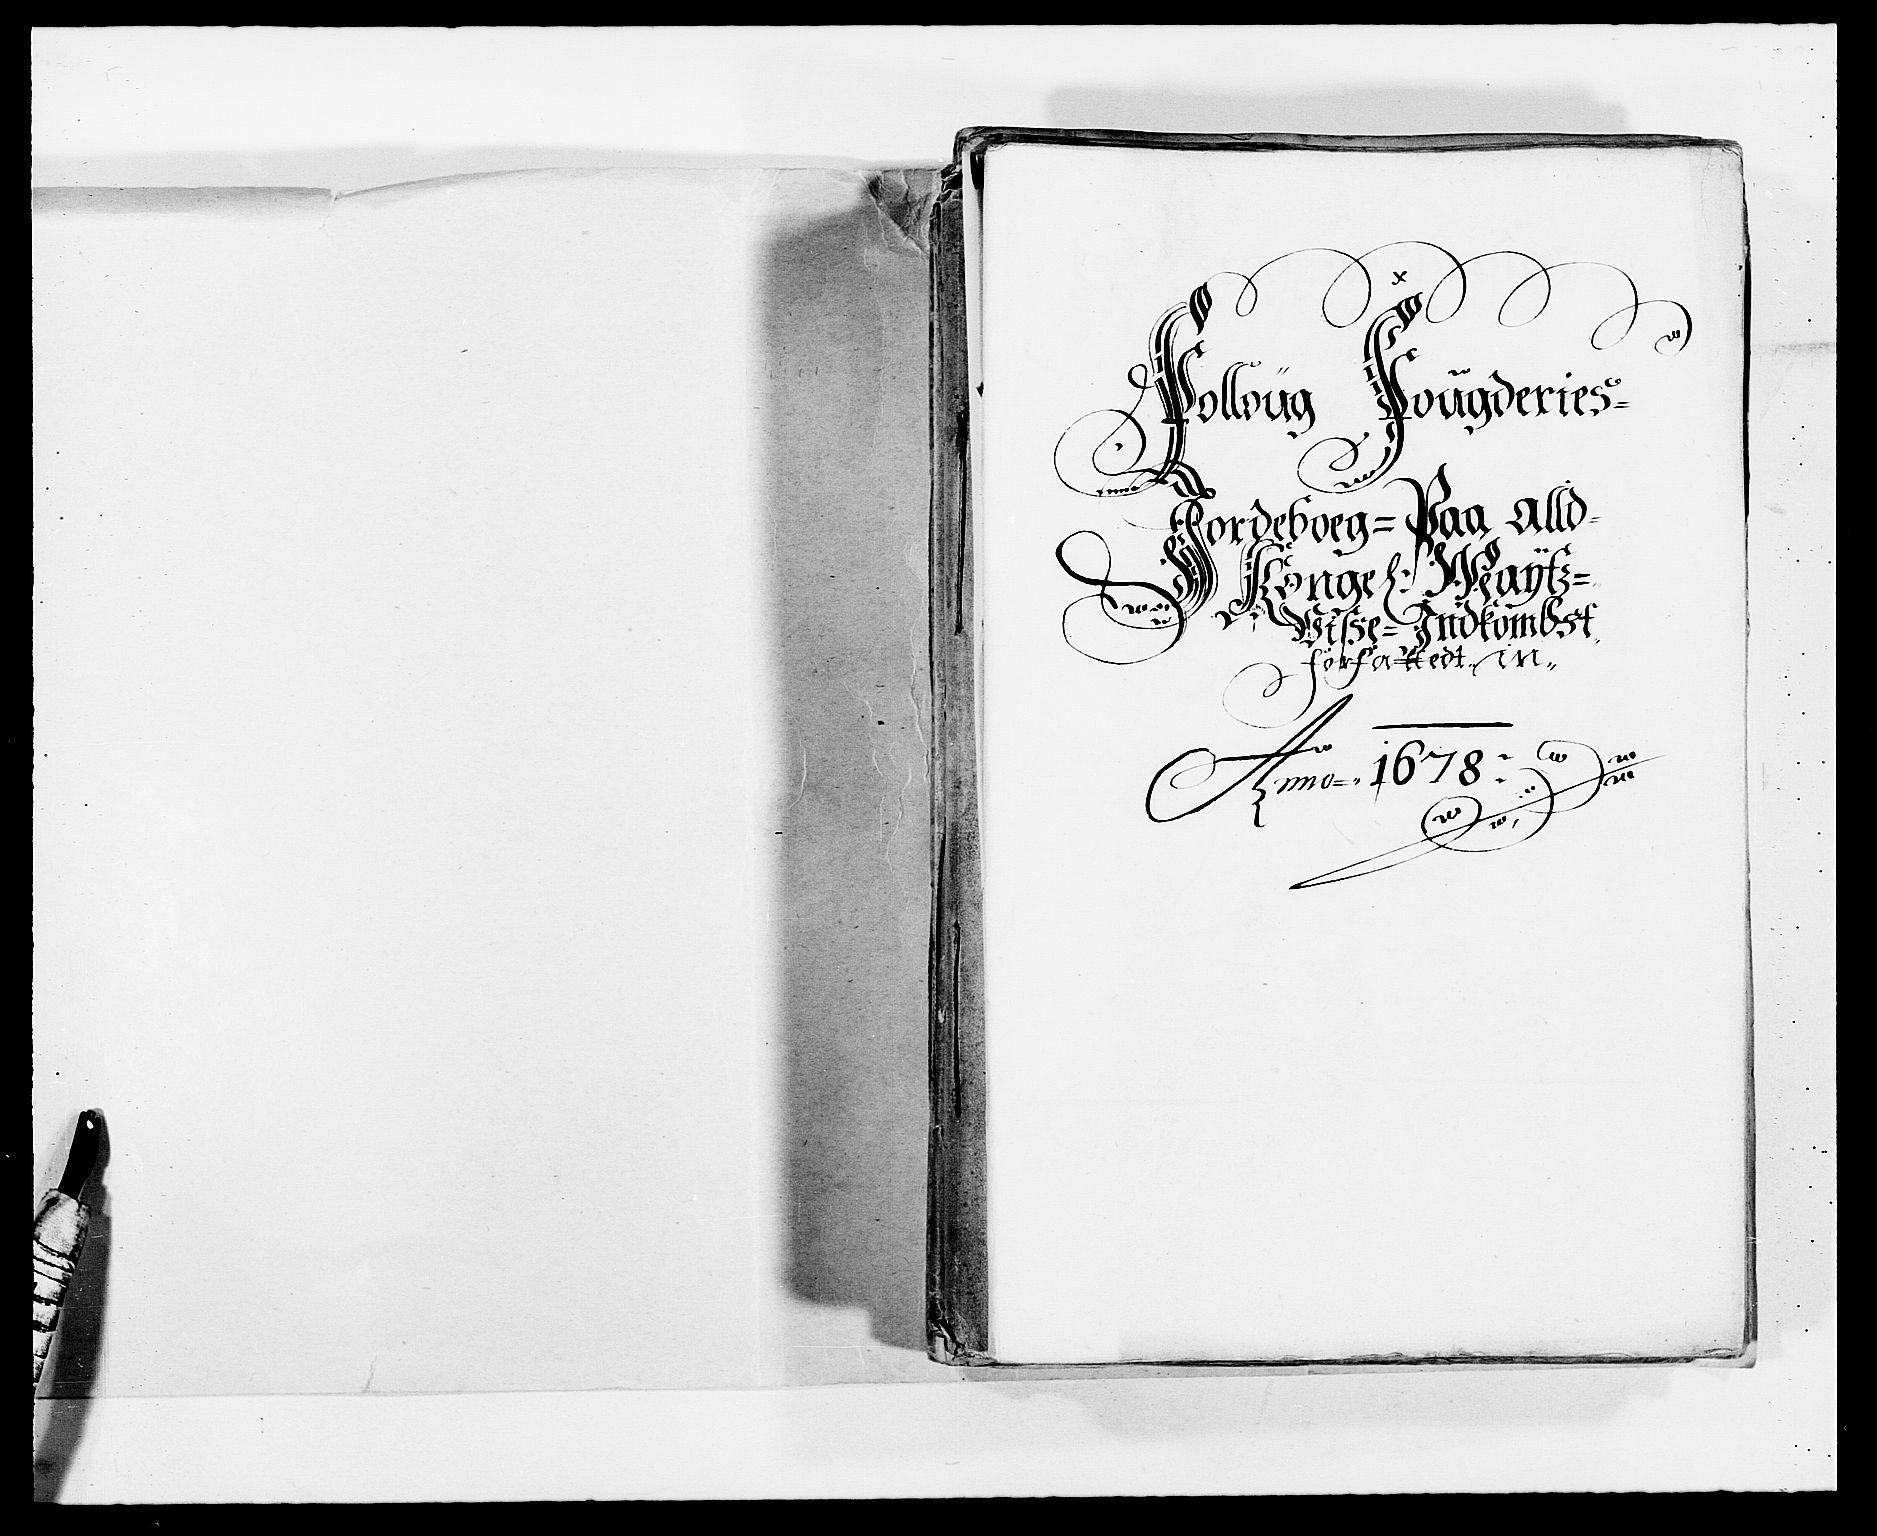 RA, Rentekammeret inntil 1814, Reviderte regnskaper, Fogderegnskap, R09/L0427: Fogderegnskap Follo, 1678, s. 8